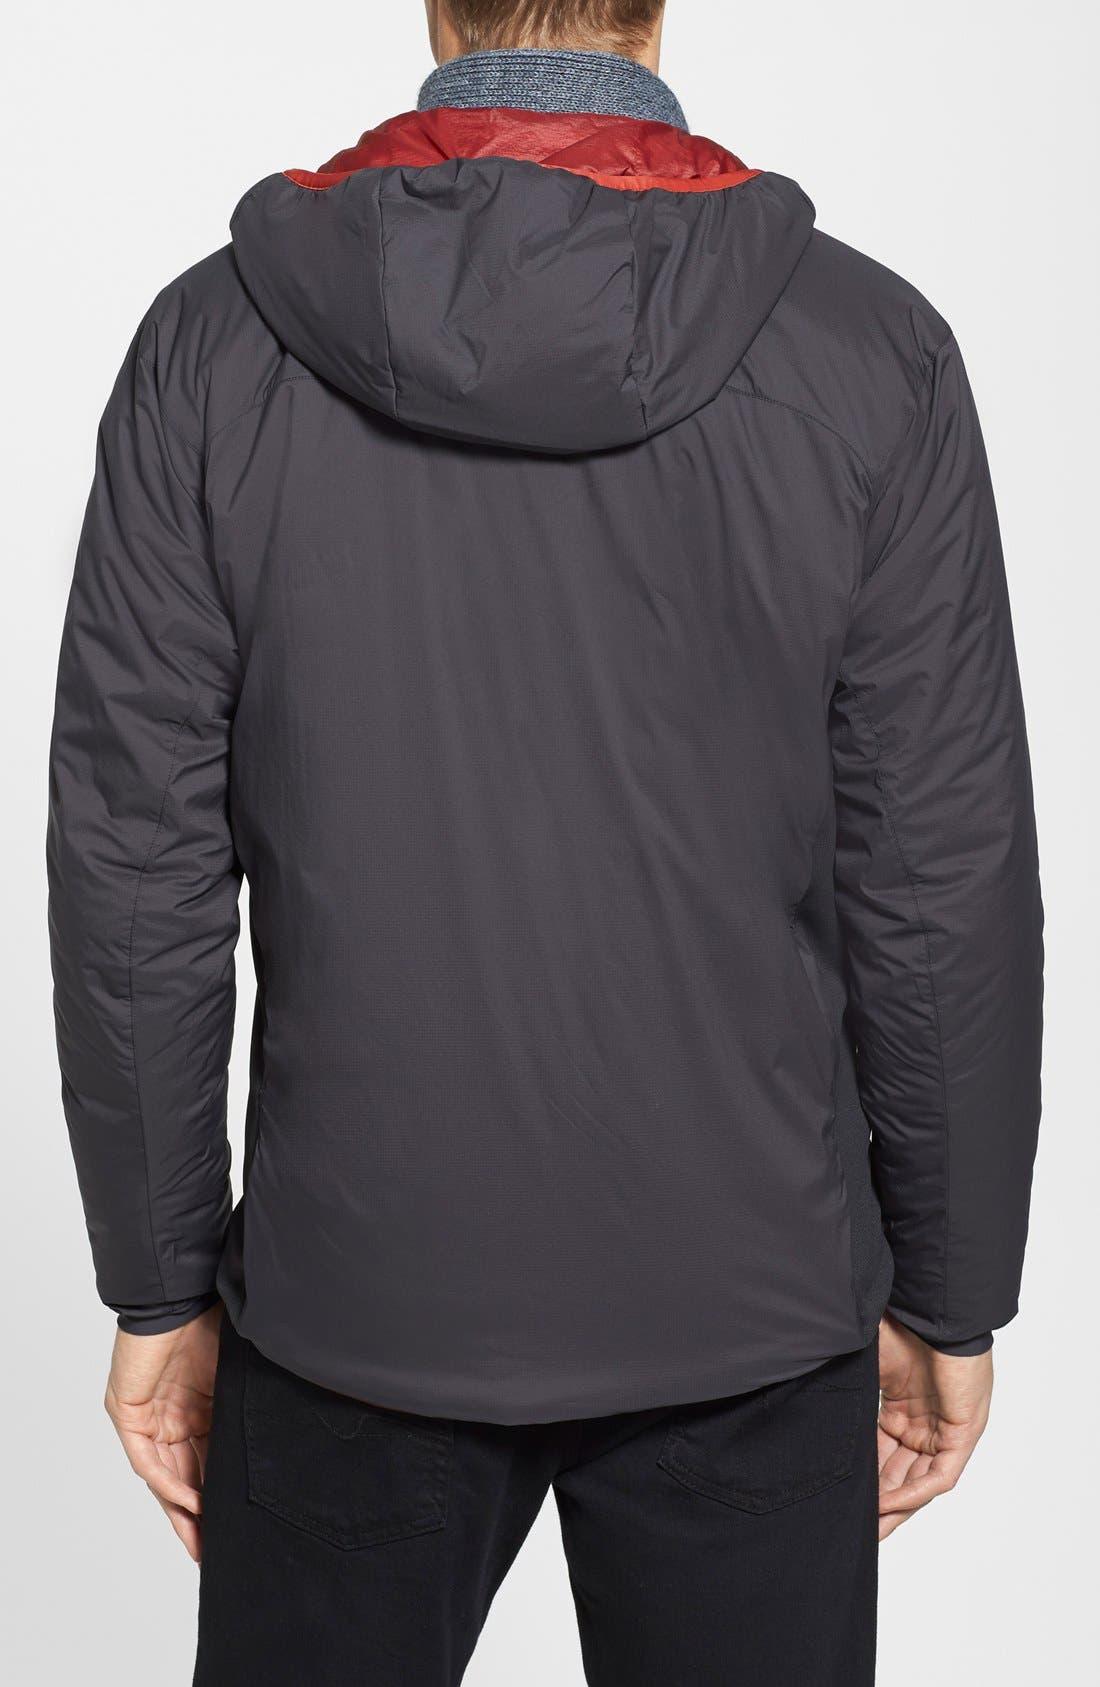 'Atom LT' Trim Fit Wind & Water Resistant Coreloft<sup>™</sup> Hooded Jacket,                             Alternate thumbnail 3, color,                             001